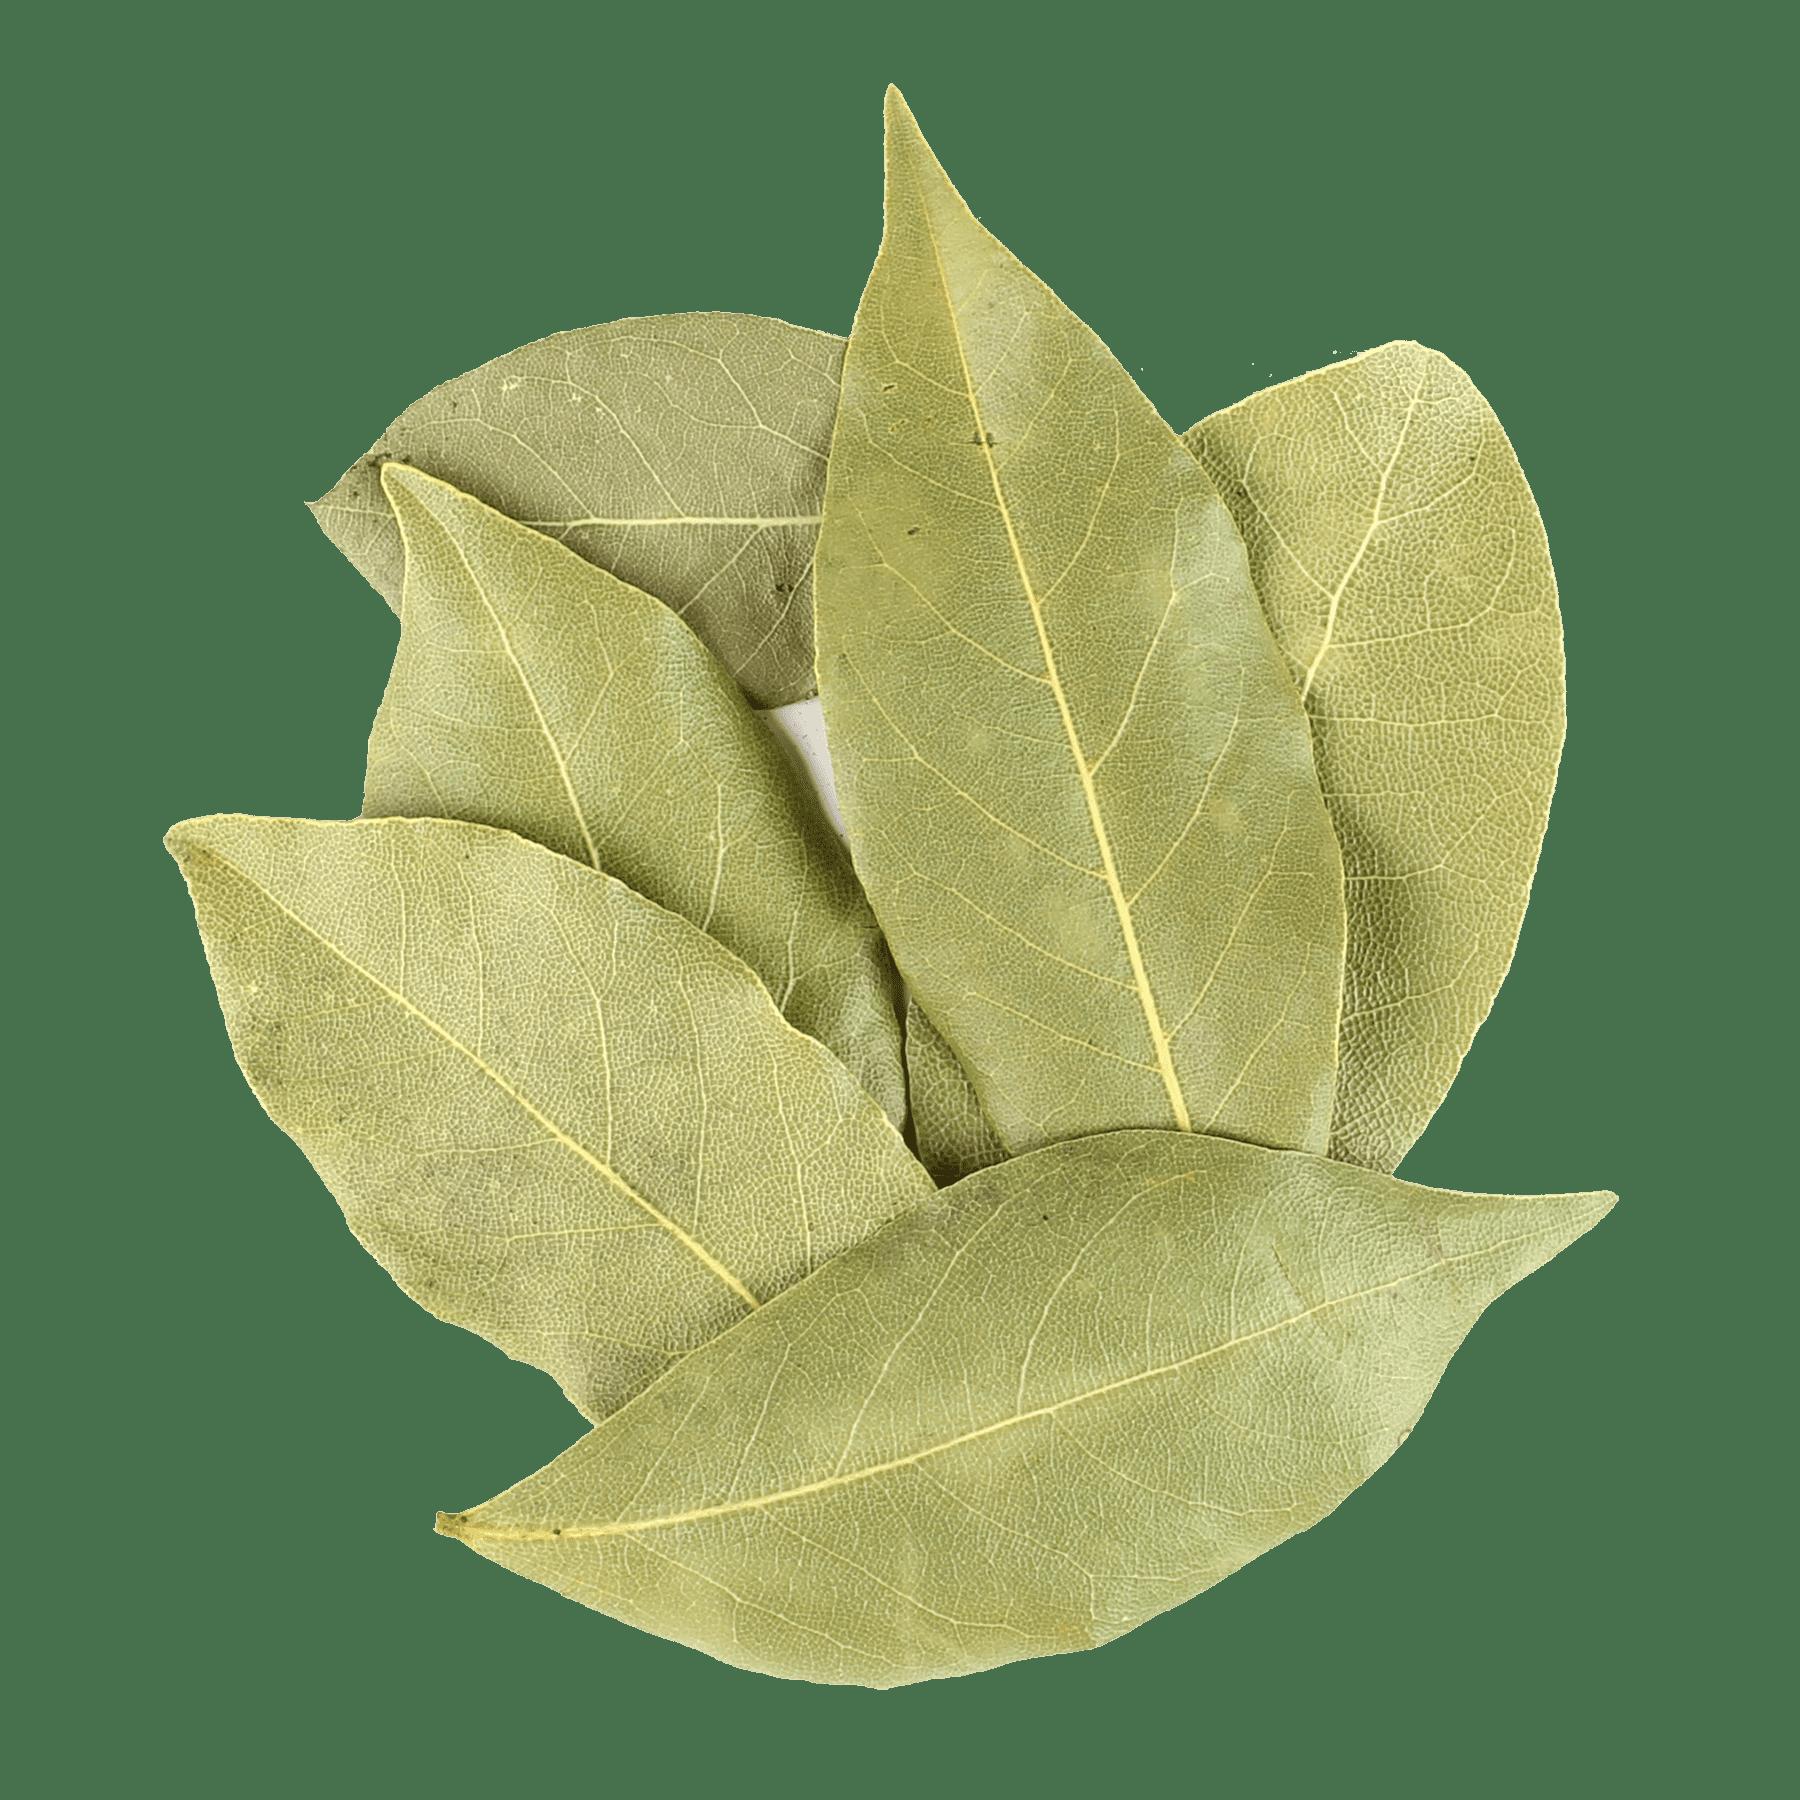 16 Ounce Bag Frontier Alfalfa Leaf Powder Certified Organic